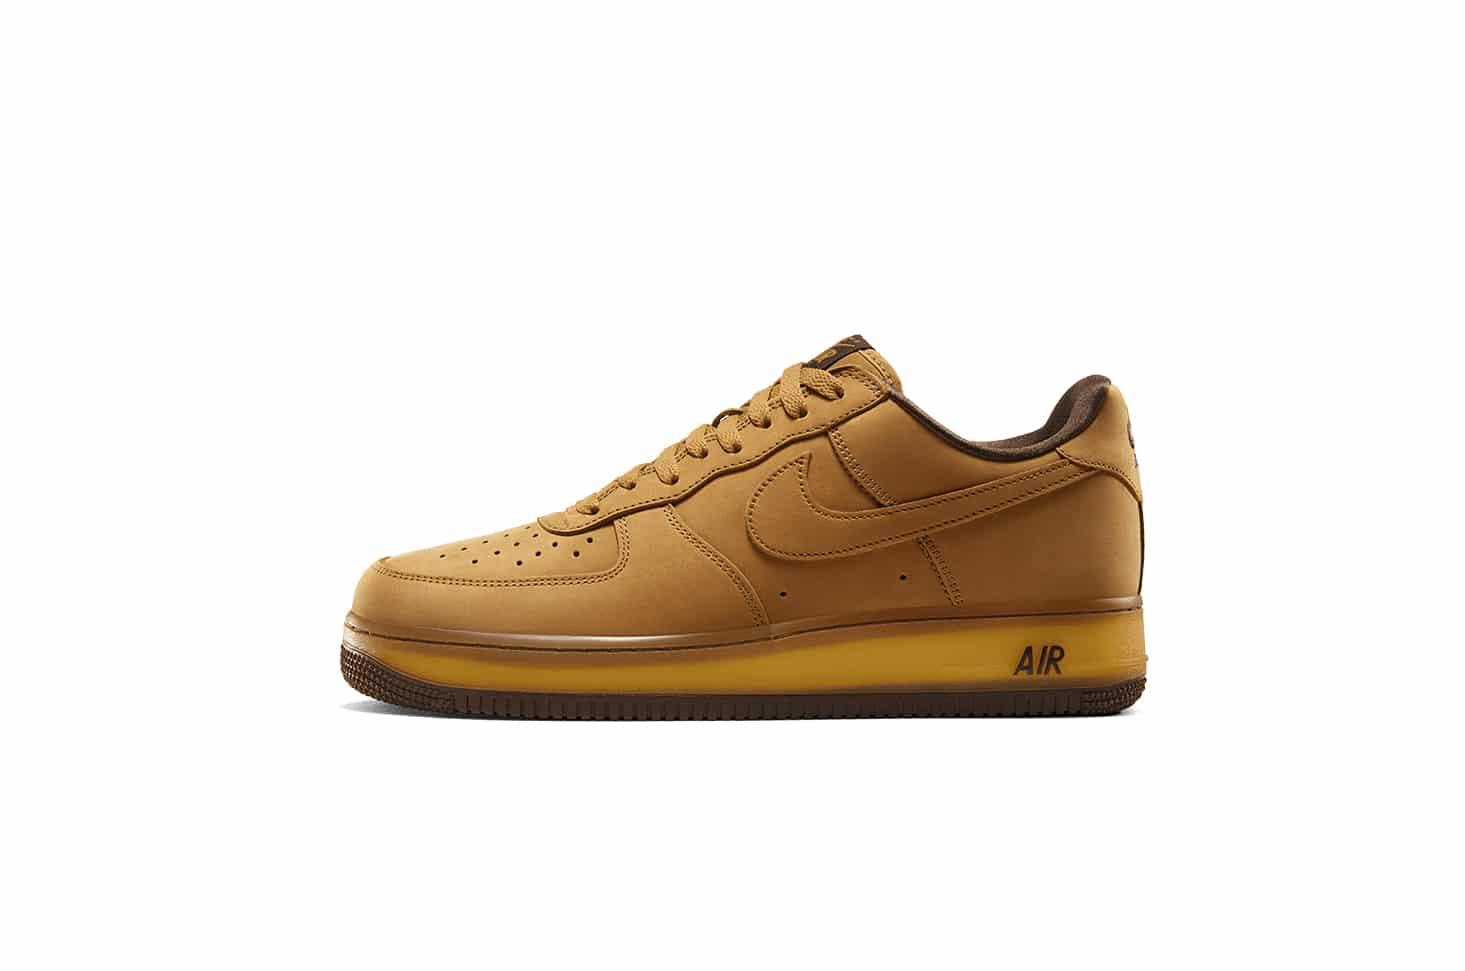 Nike Air Force 1 Low Wheat Mocha - Gov